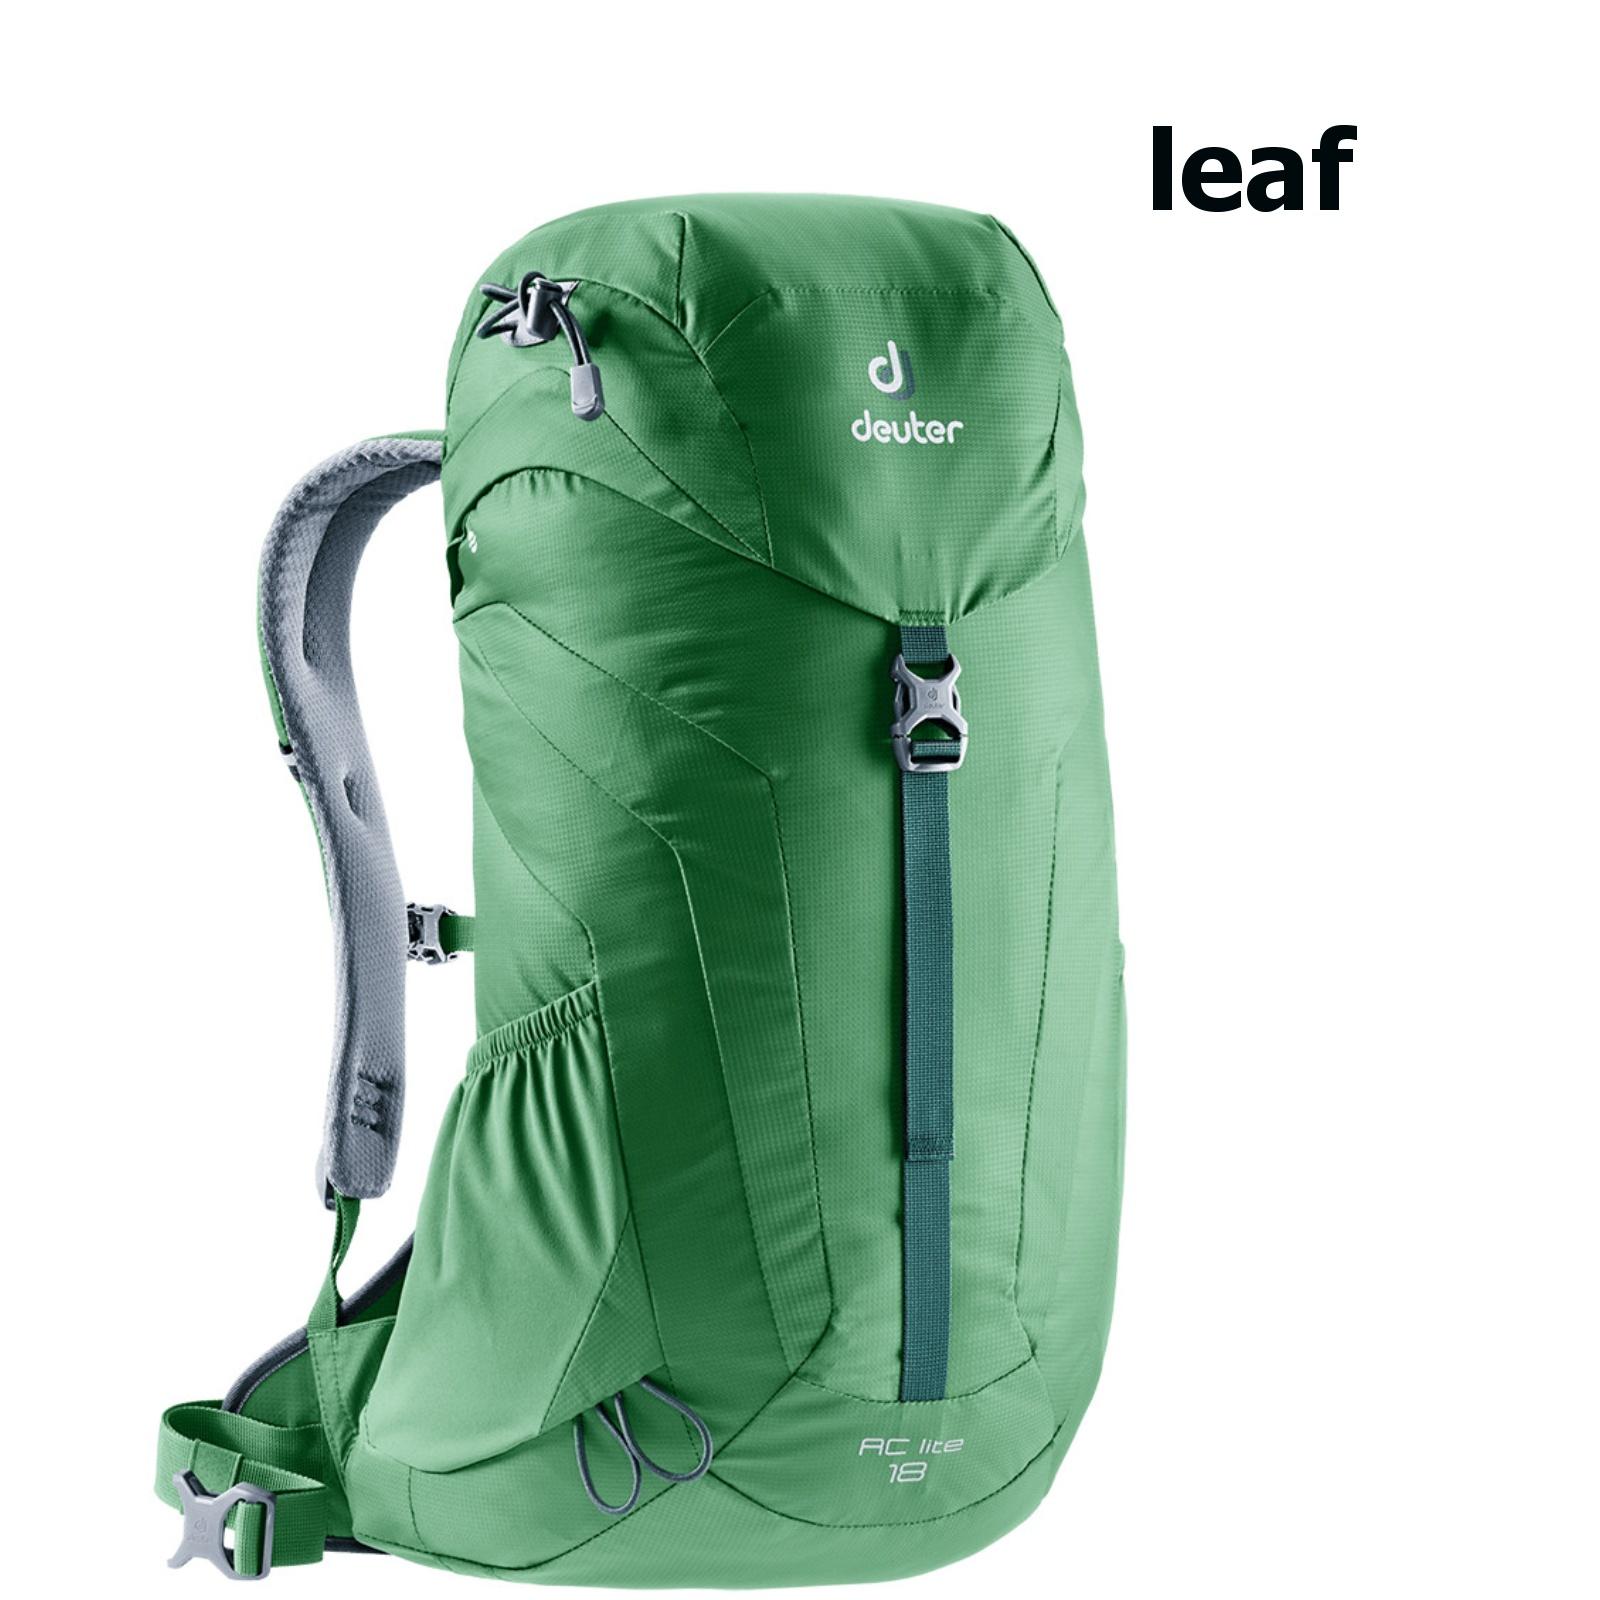 Deuter AC Lite 18 leaf